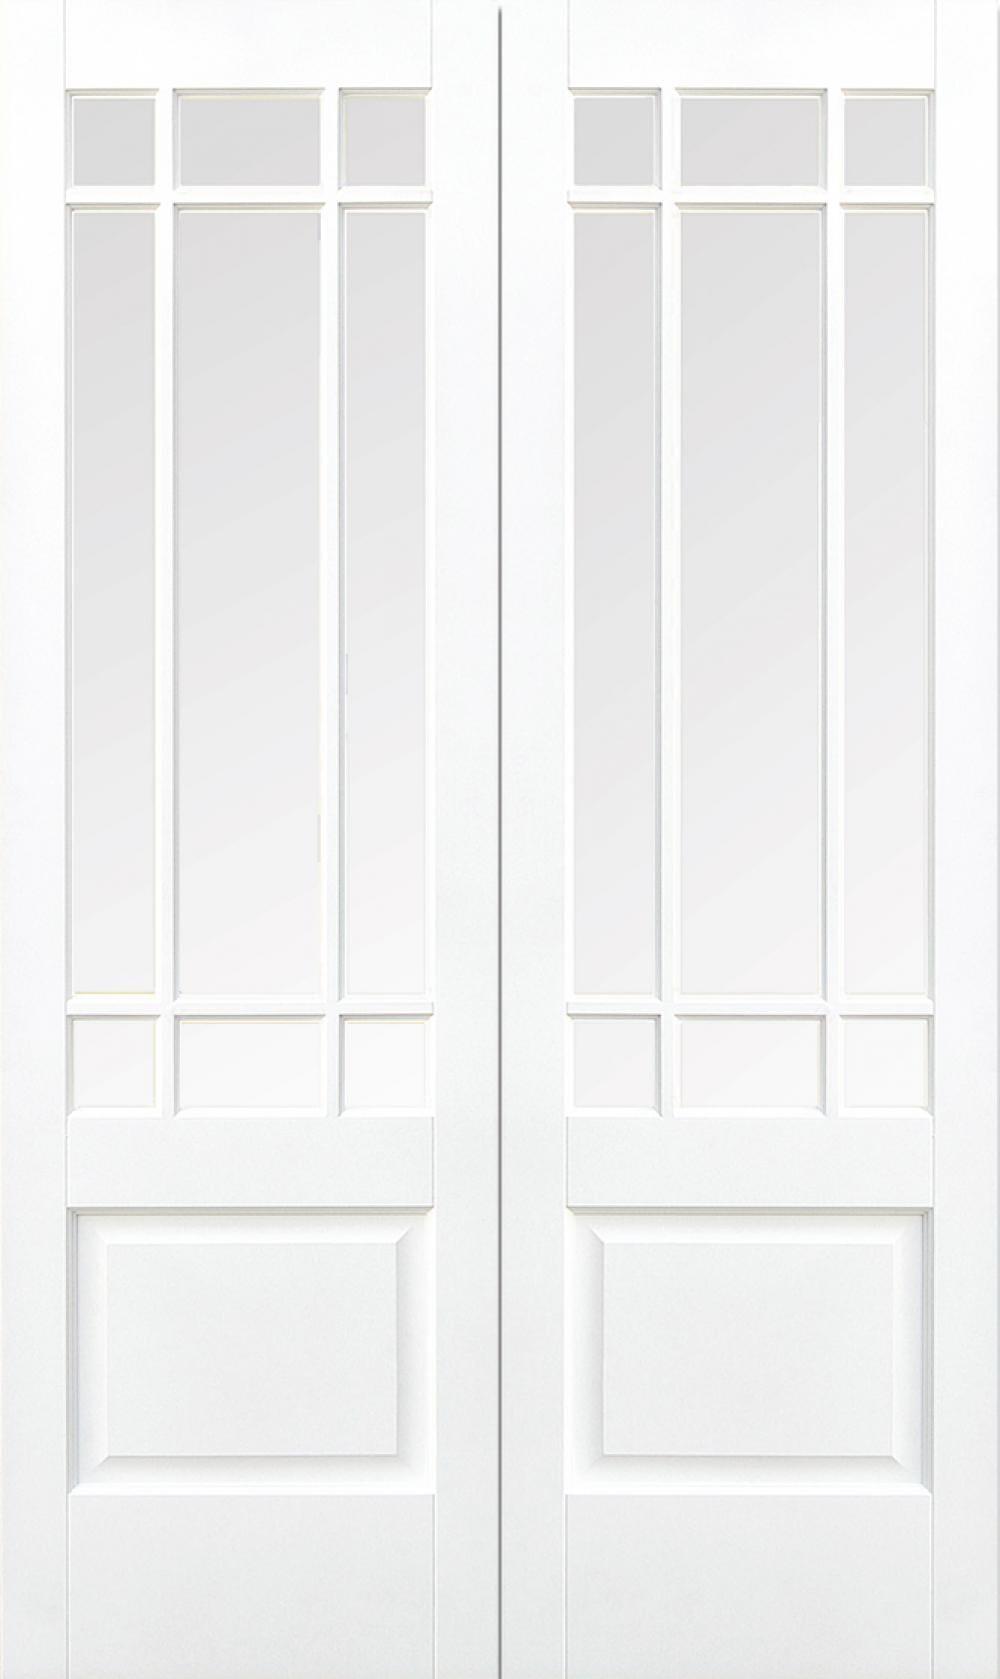 Downham White Glazed Pair - Clear Bevelled Glass Image